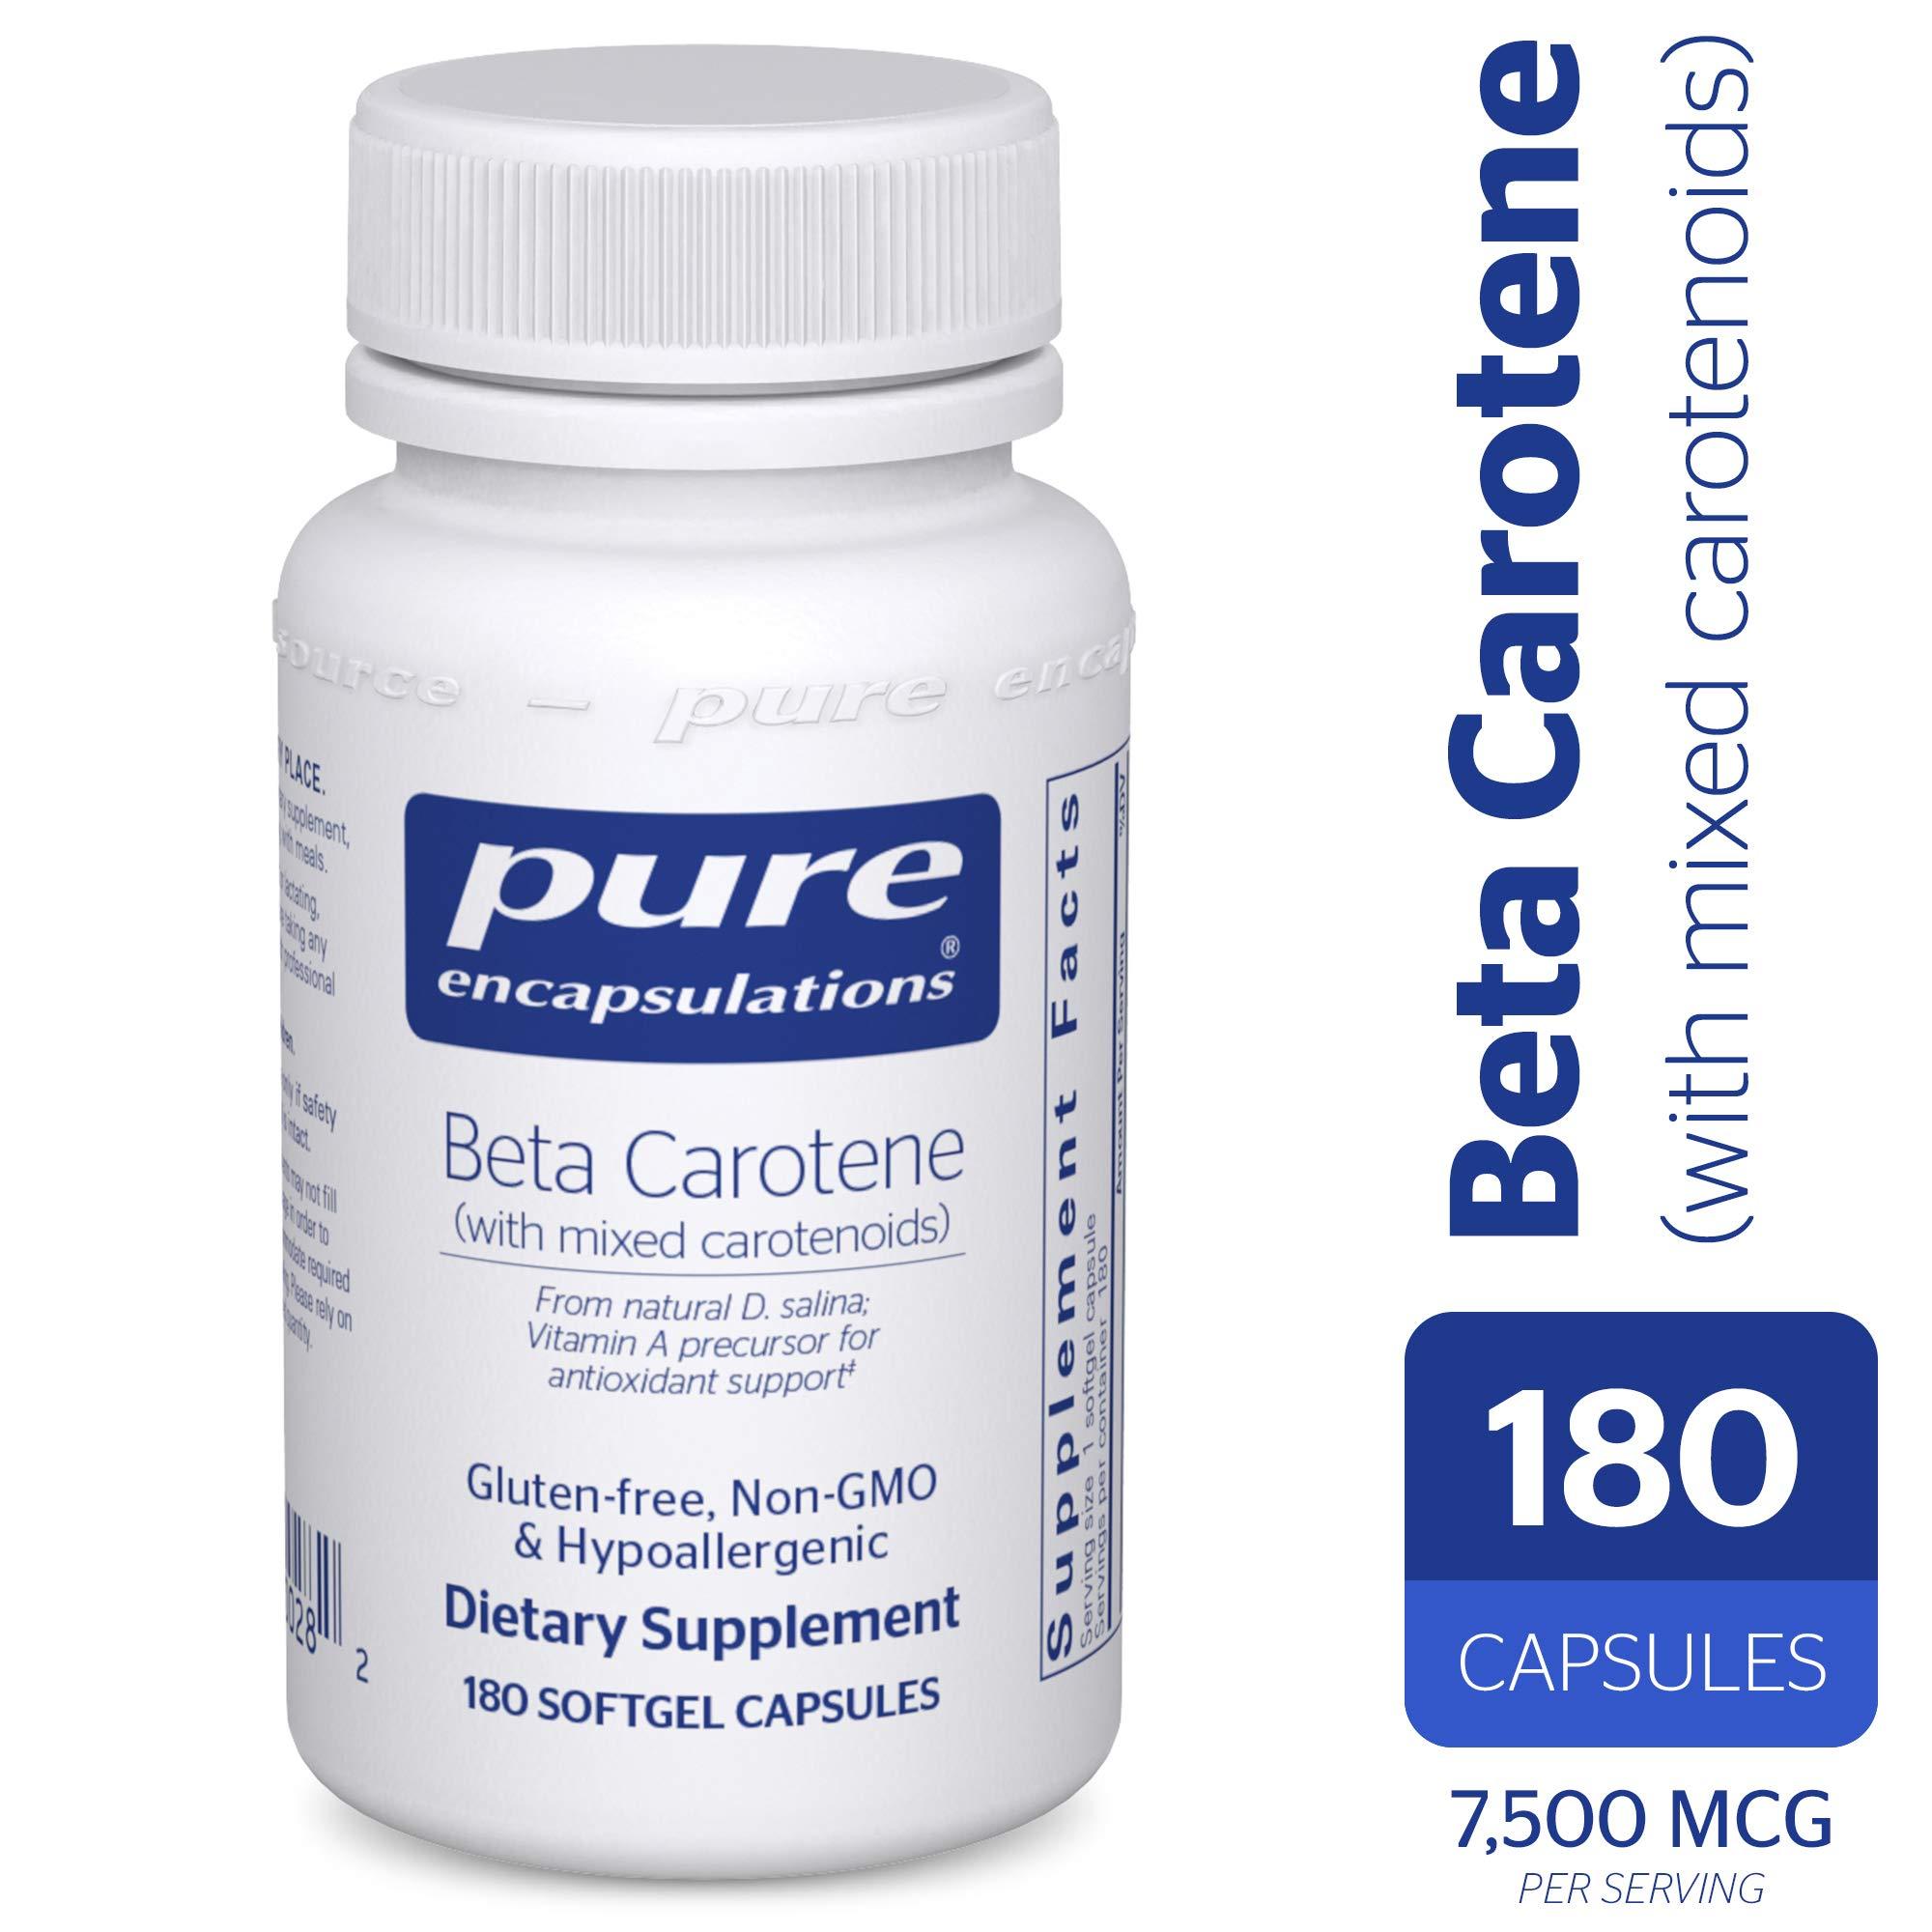 Pure Encapsulations - Beta Carotene with Mixed Carotenoids - Hypoallergenic Antioxidant and Vitamin A Precursor Supplement - 180 Softgel Capsules